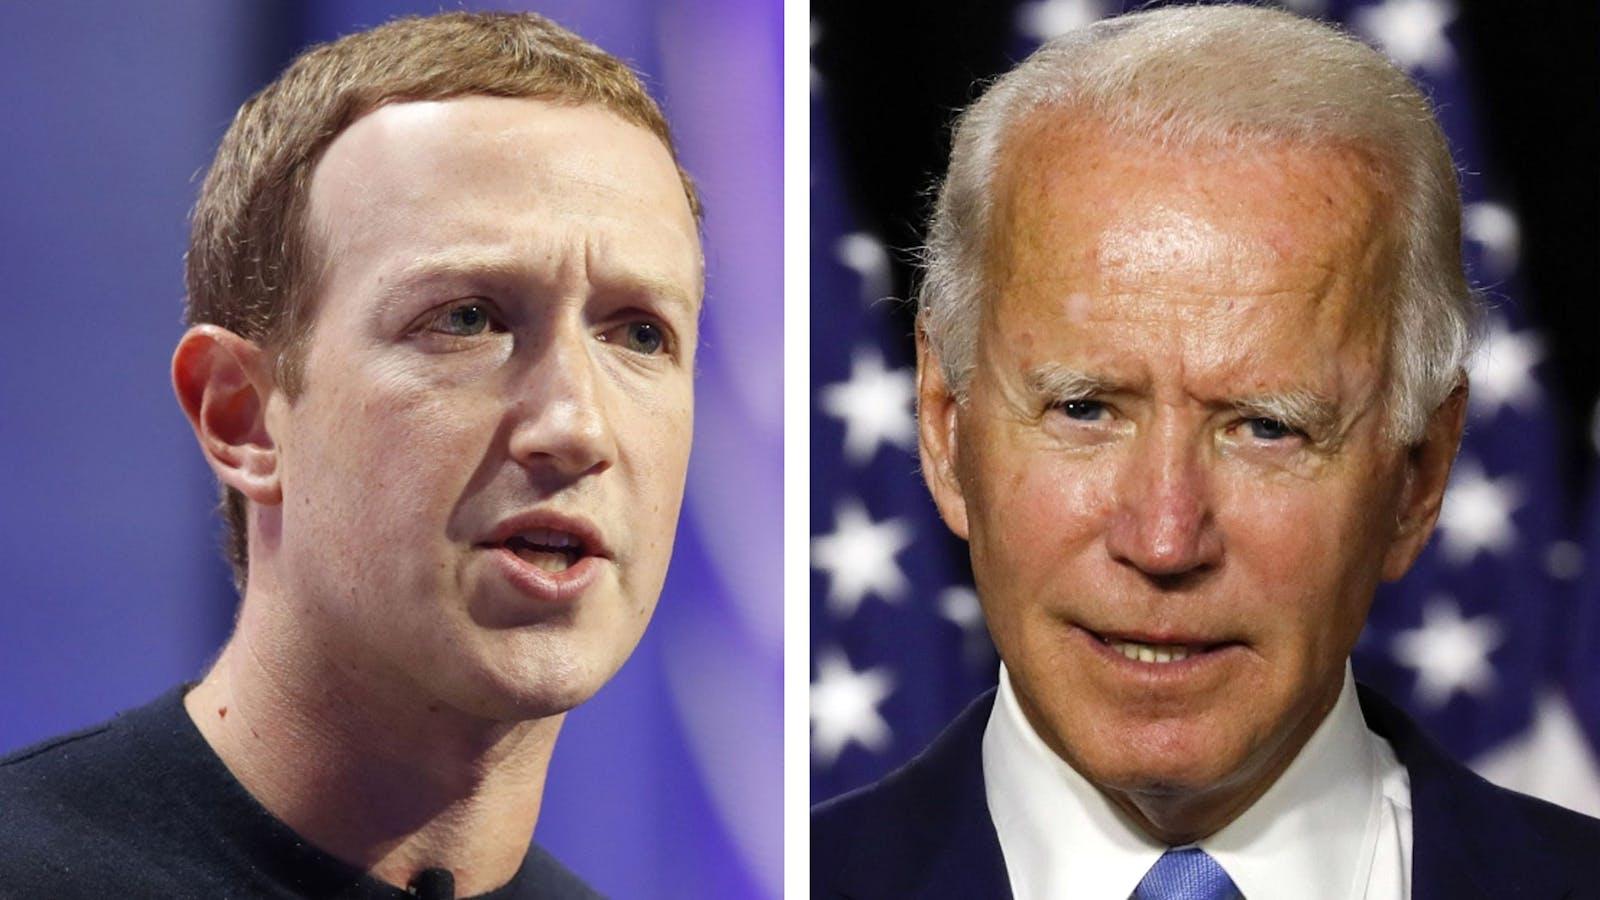 Mark Zuckerberg, left, and Joe Biden. Photos by Bloomberg